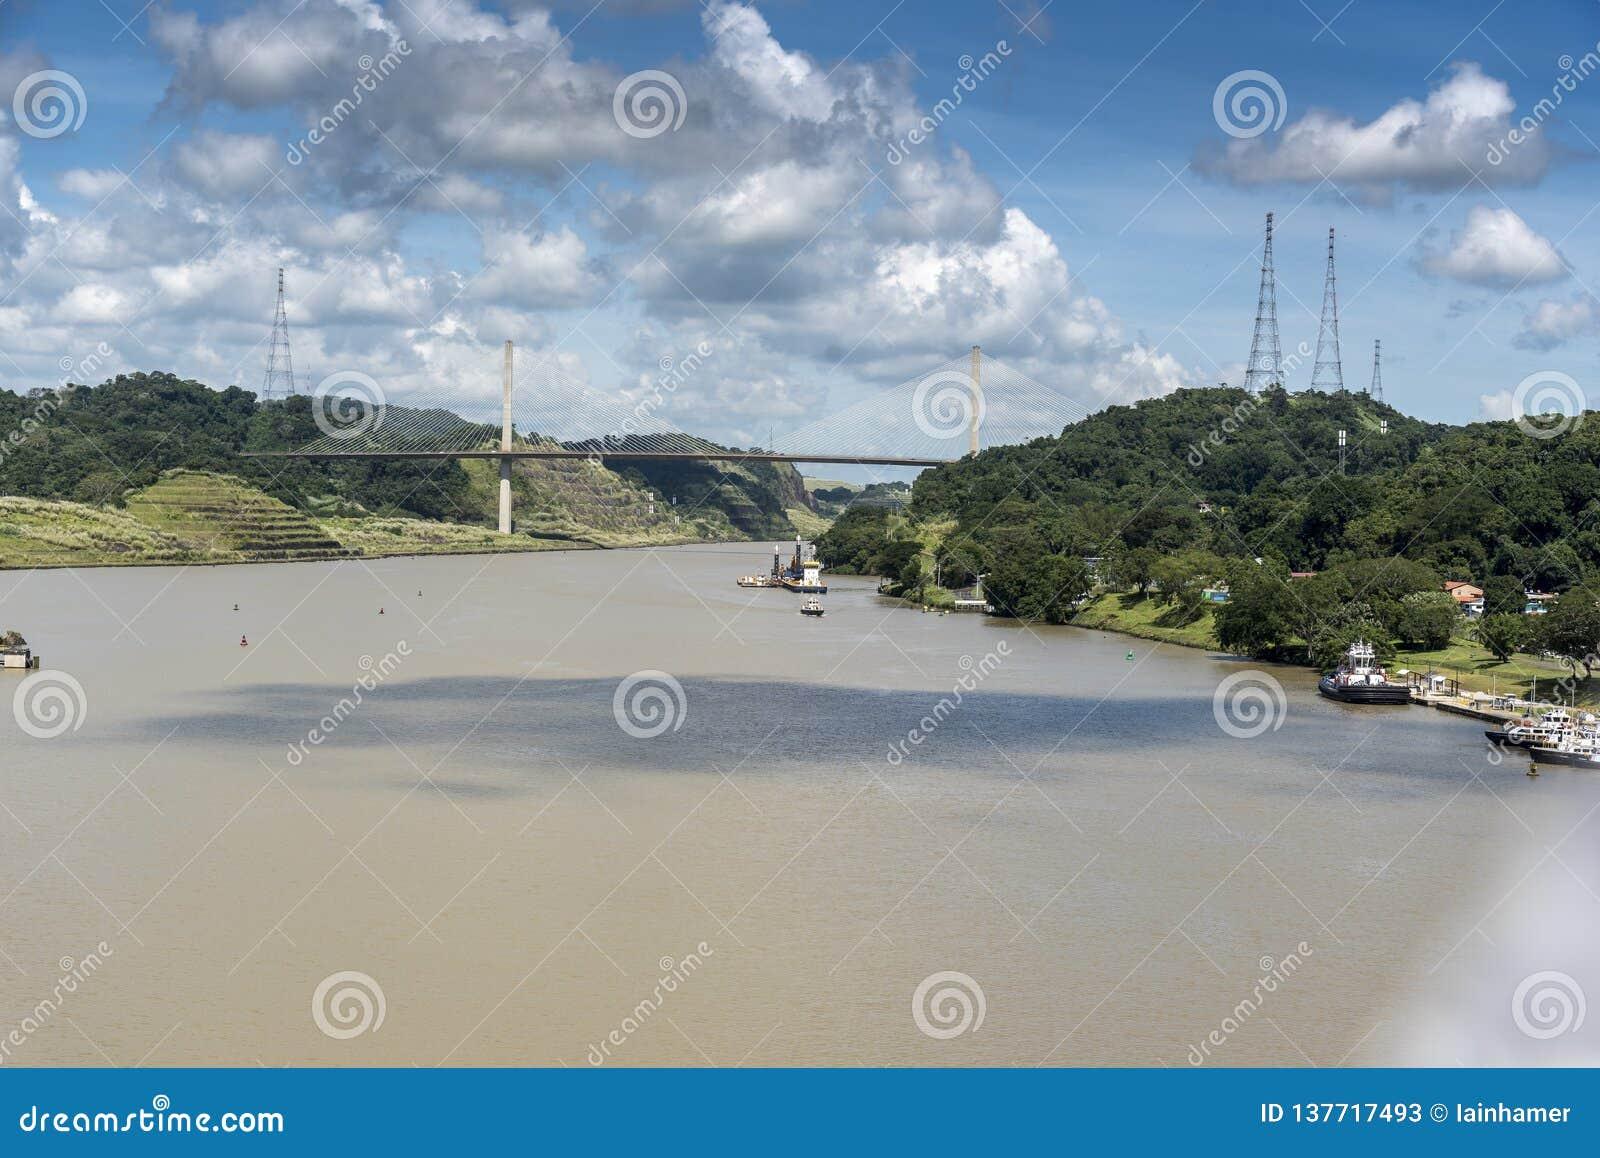 Centennial Bridge over the Panama Canal from Island Princess